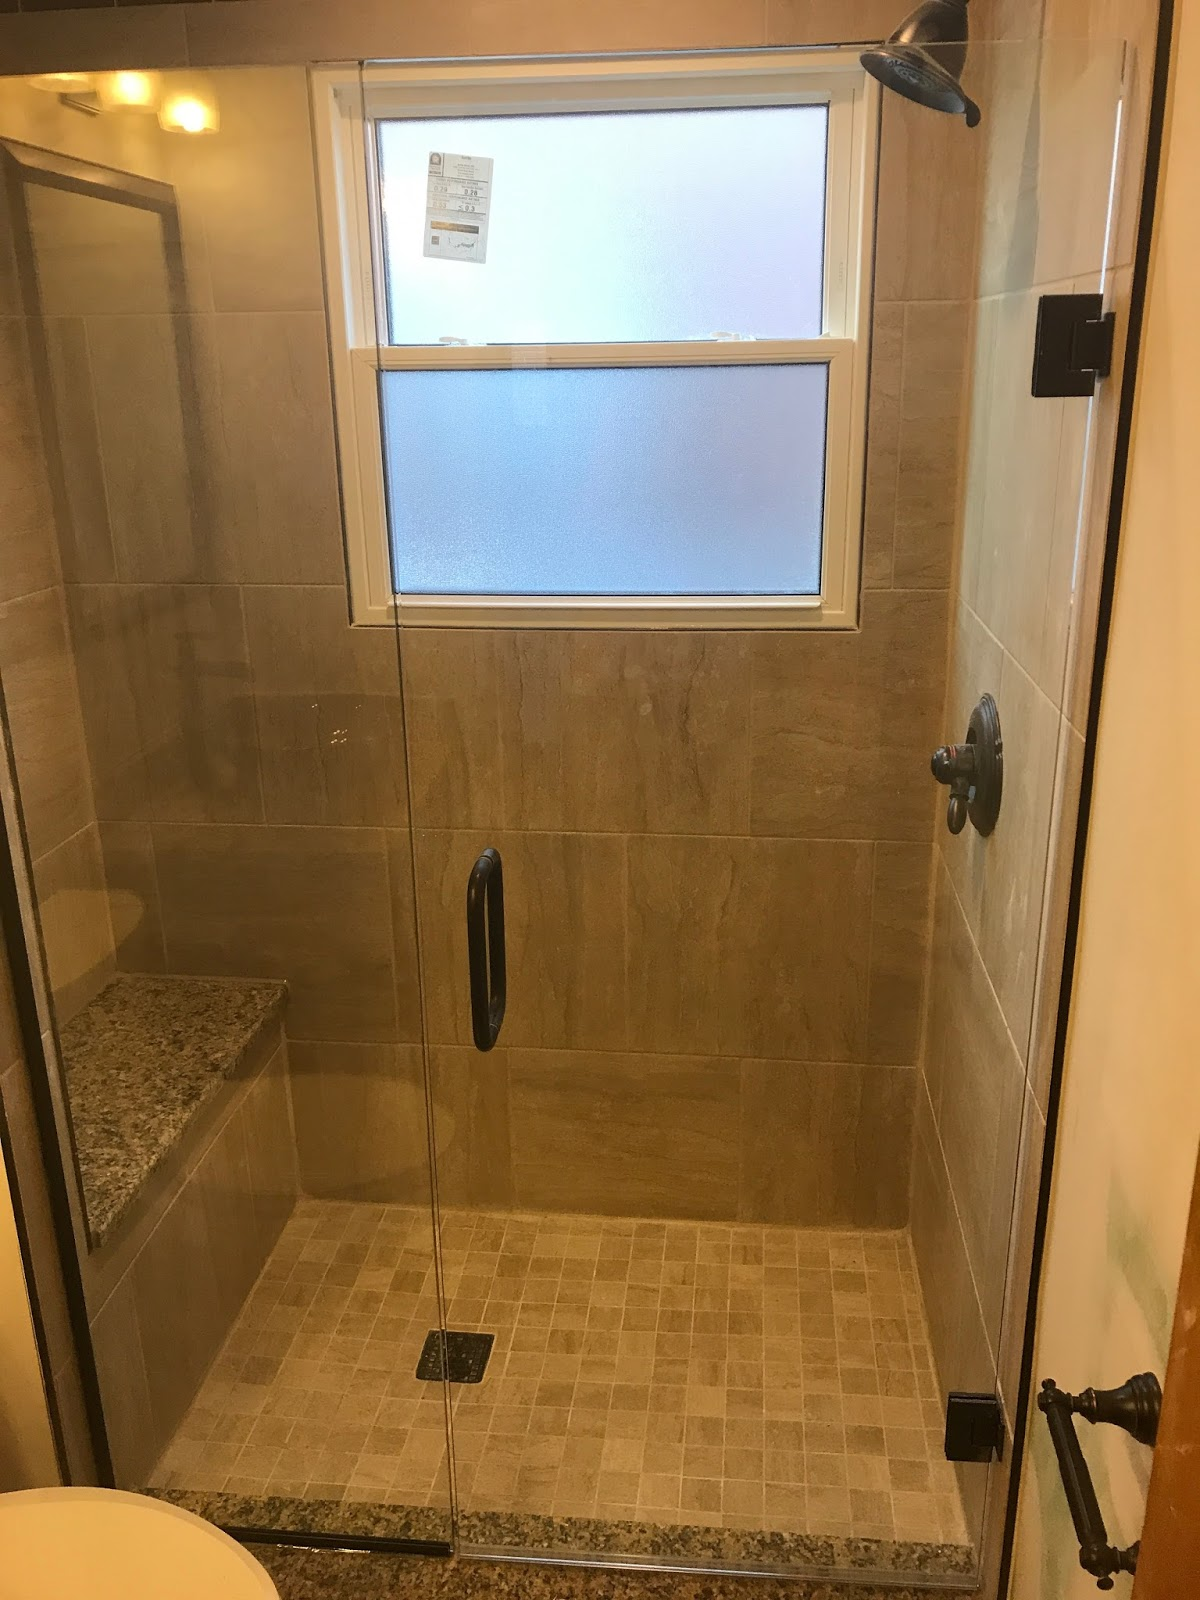 Home Base Home Improvement Construction Kitchen Remodeling - Home improvement bathroom remodel